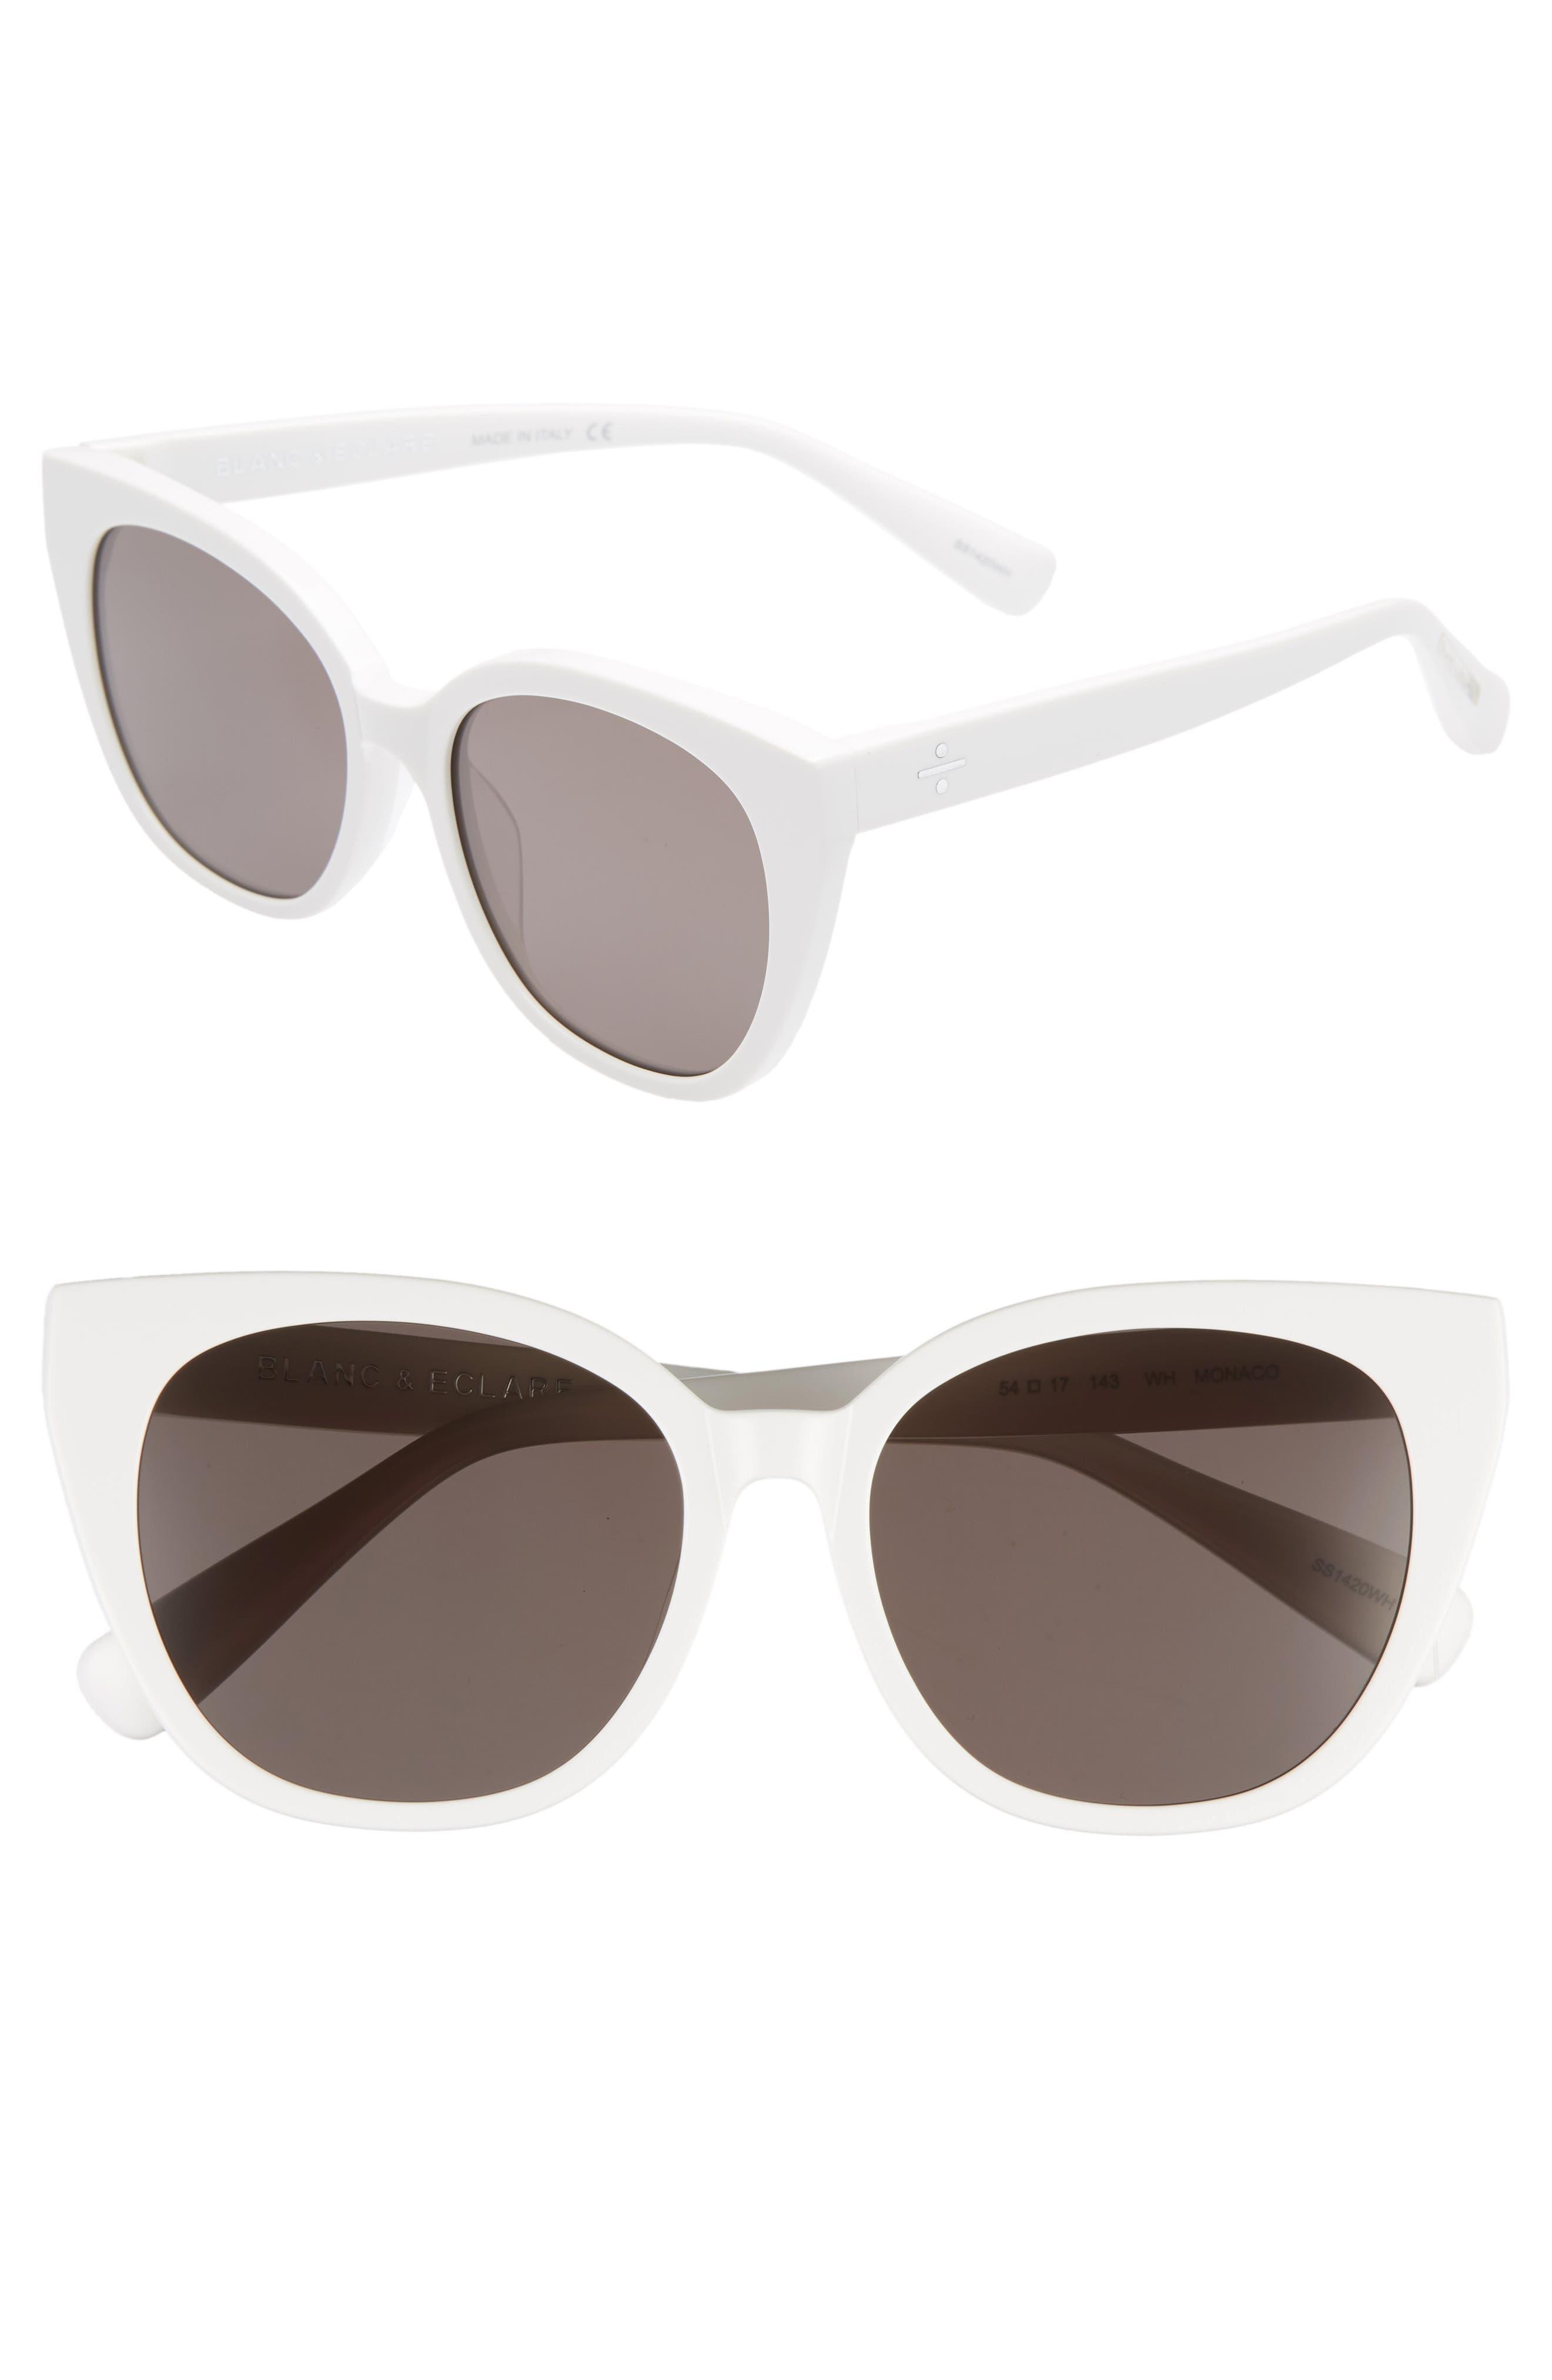 BLANC & ECLARE Monaco 54mm Cat Eye Sunglasses,                             Main thumbnail 1, color,                             SNOW/ SMOG GREY